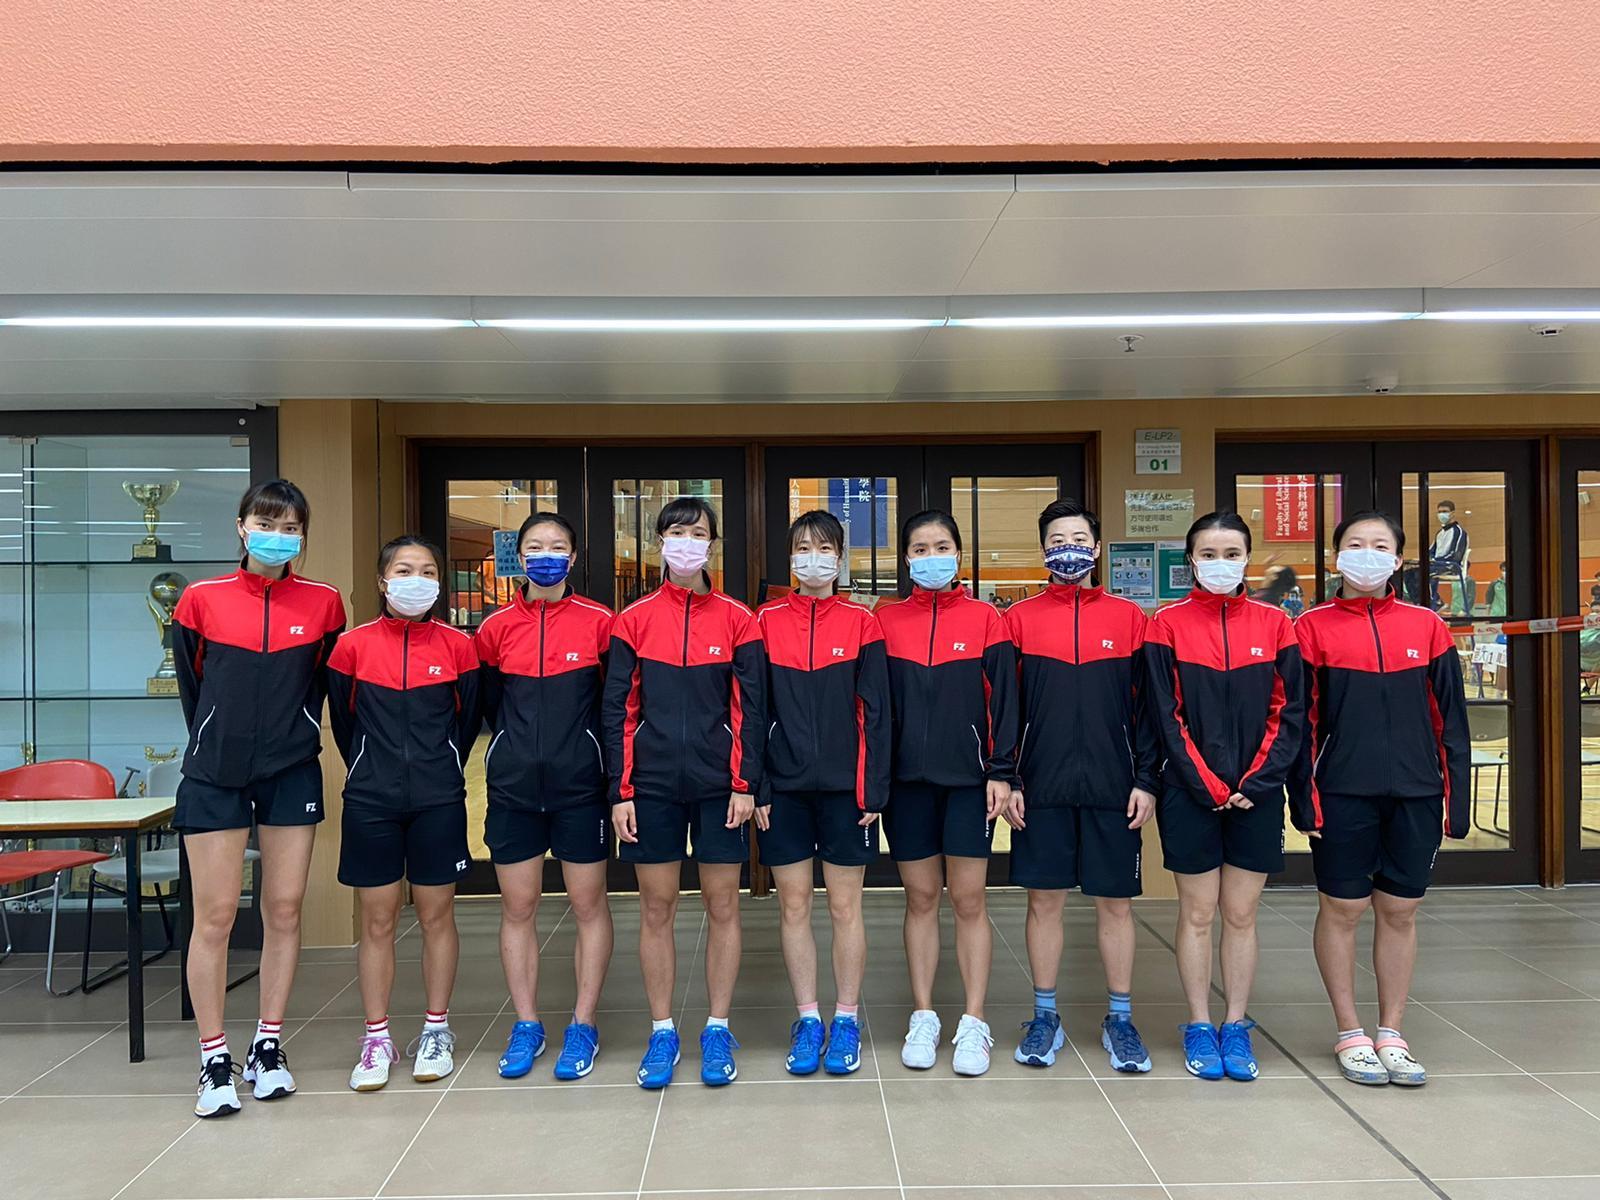 Badminton girls 2020 2021